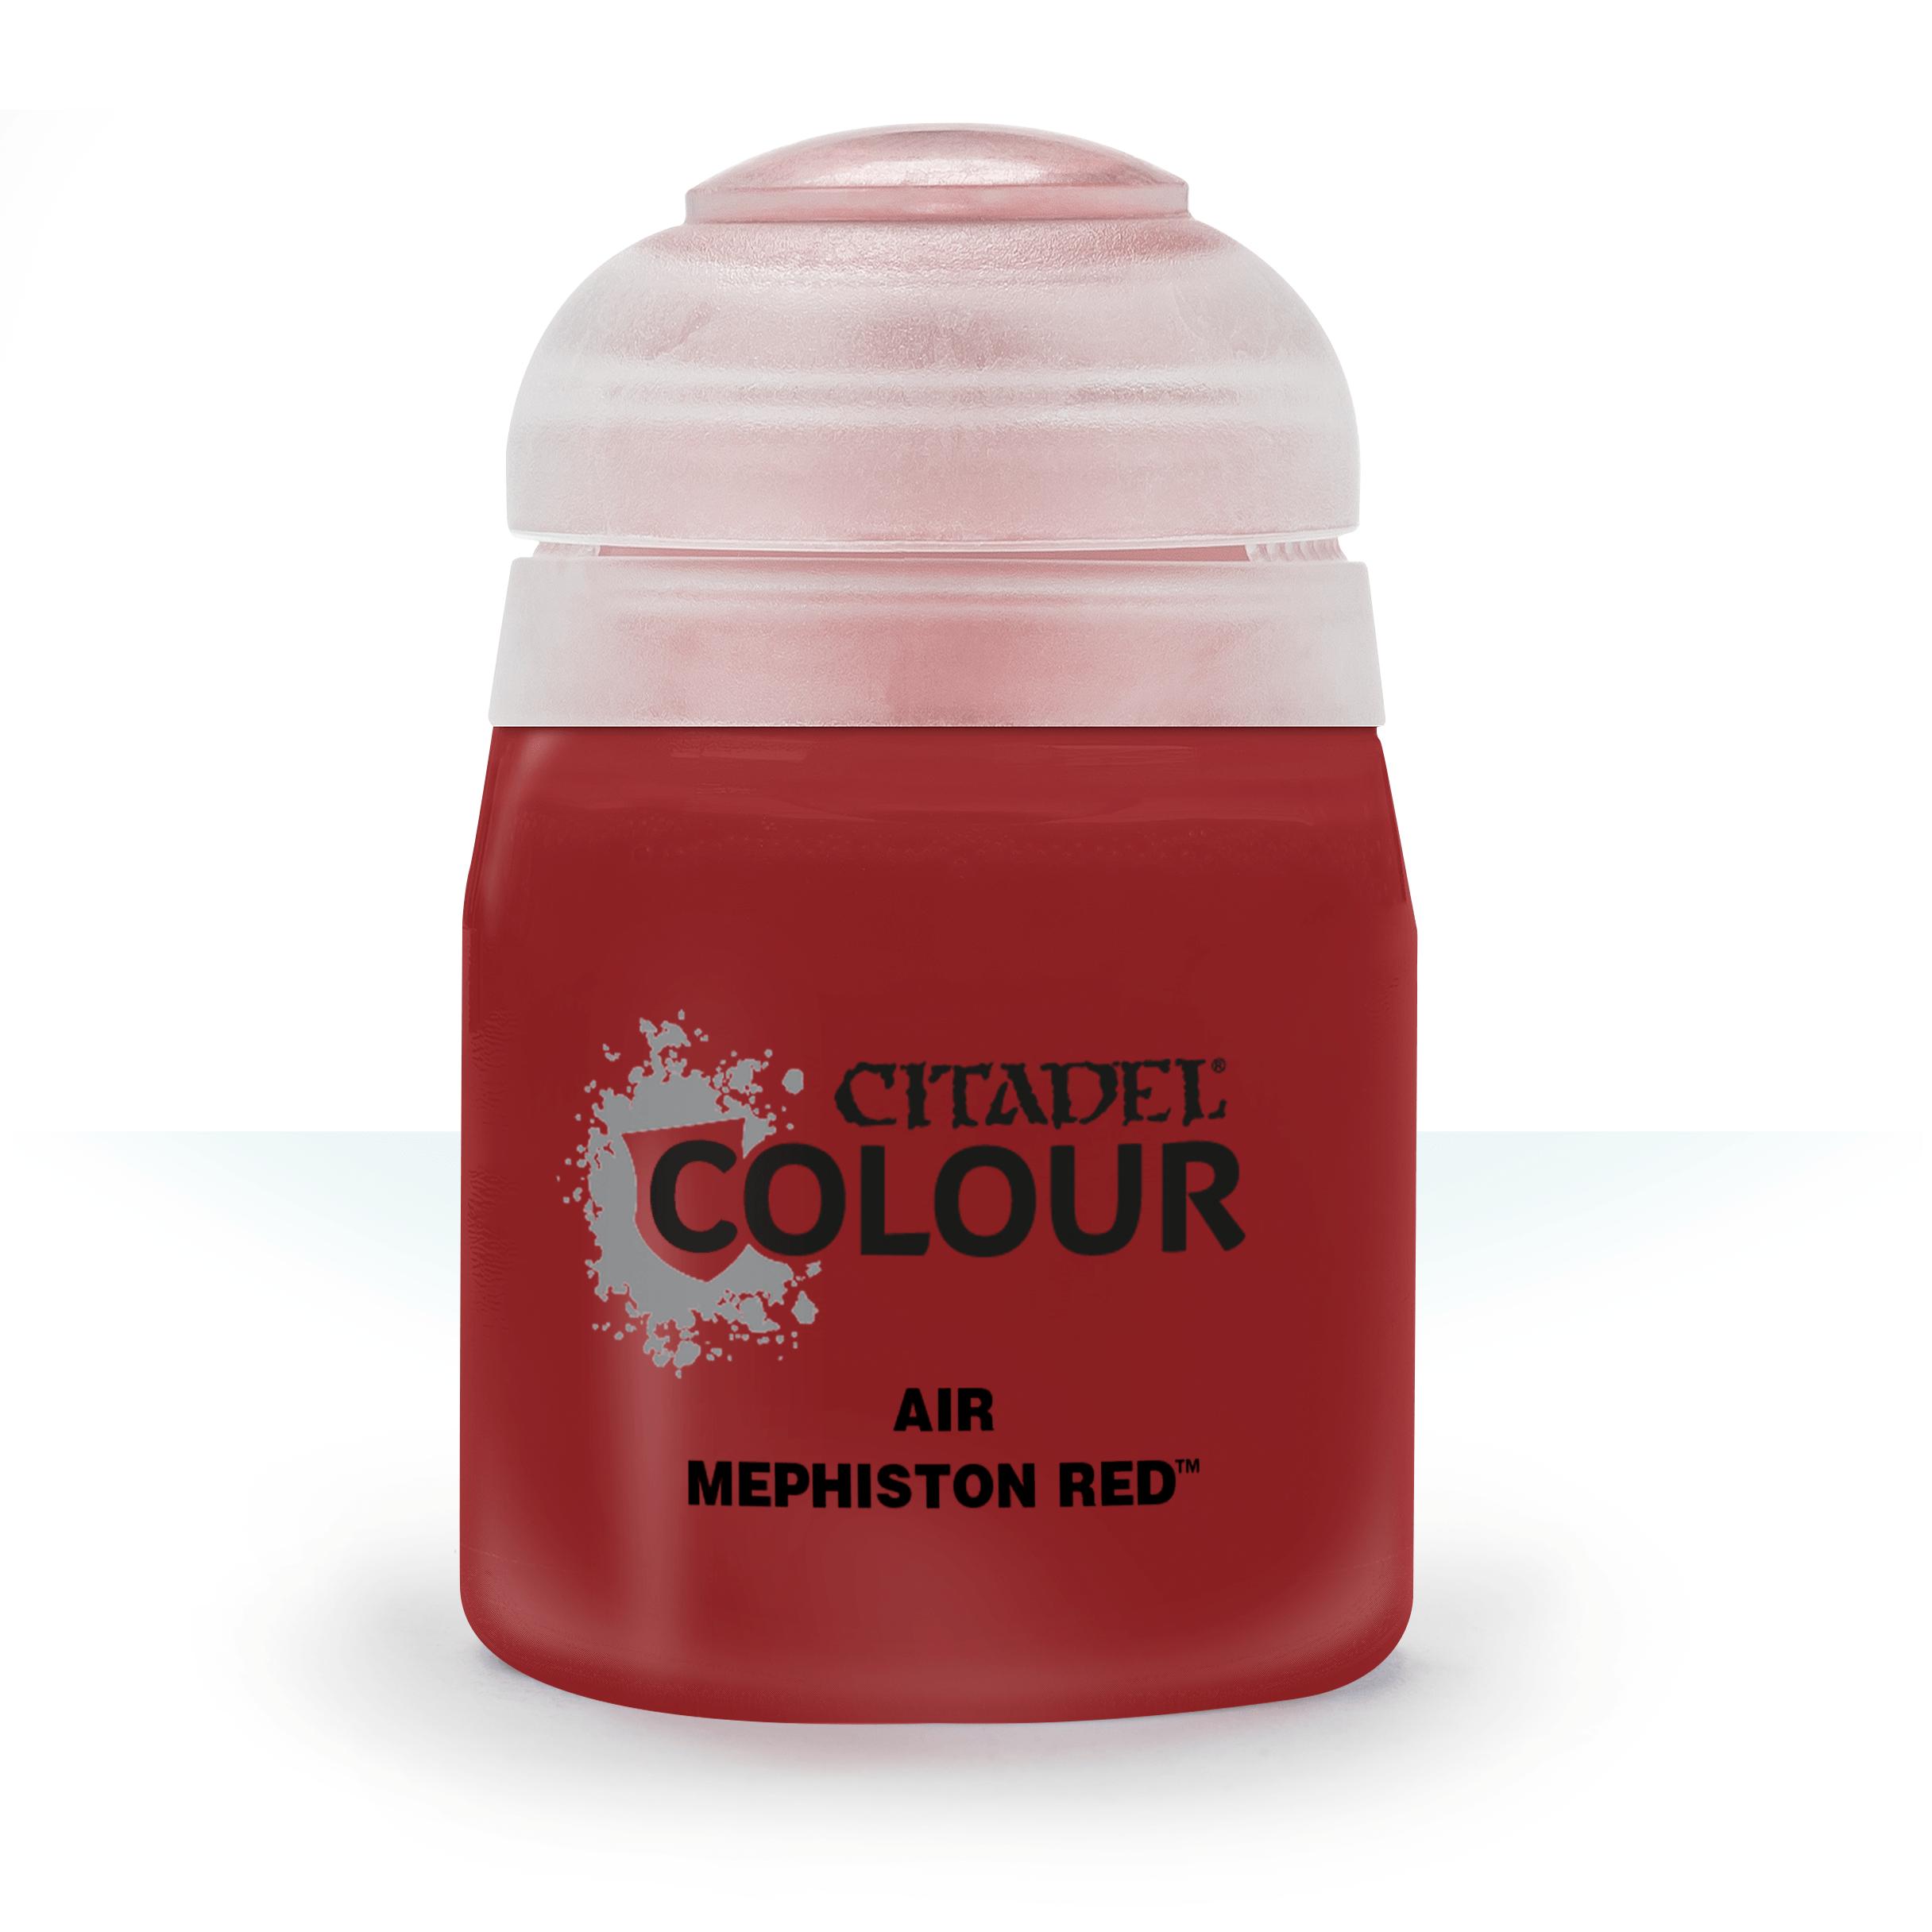 Mephiston Red, Citadel Air 24ml